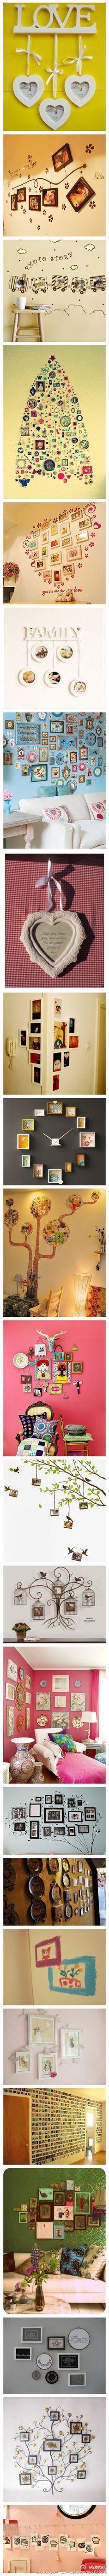 Nice ideas!!